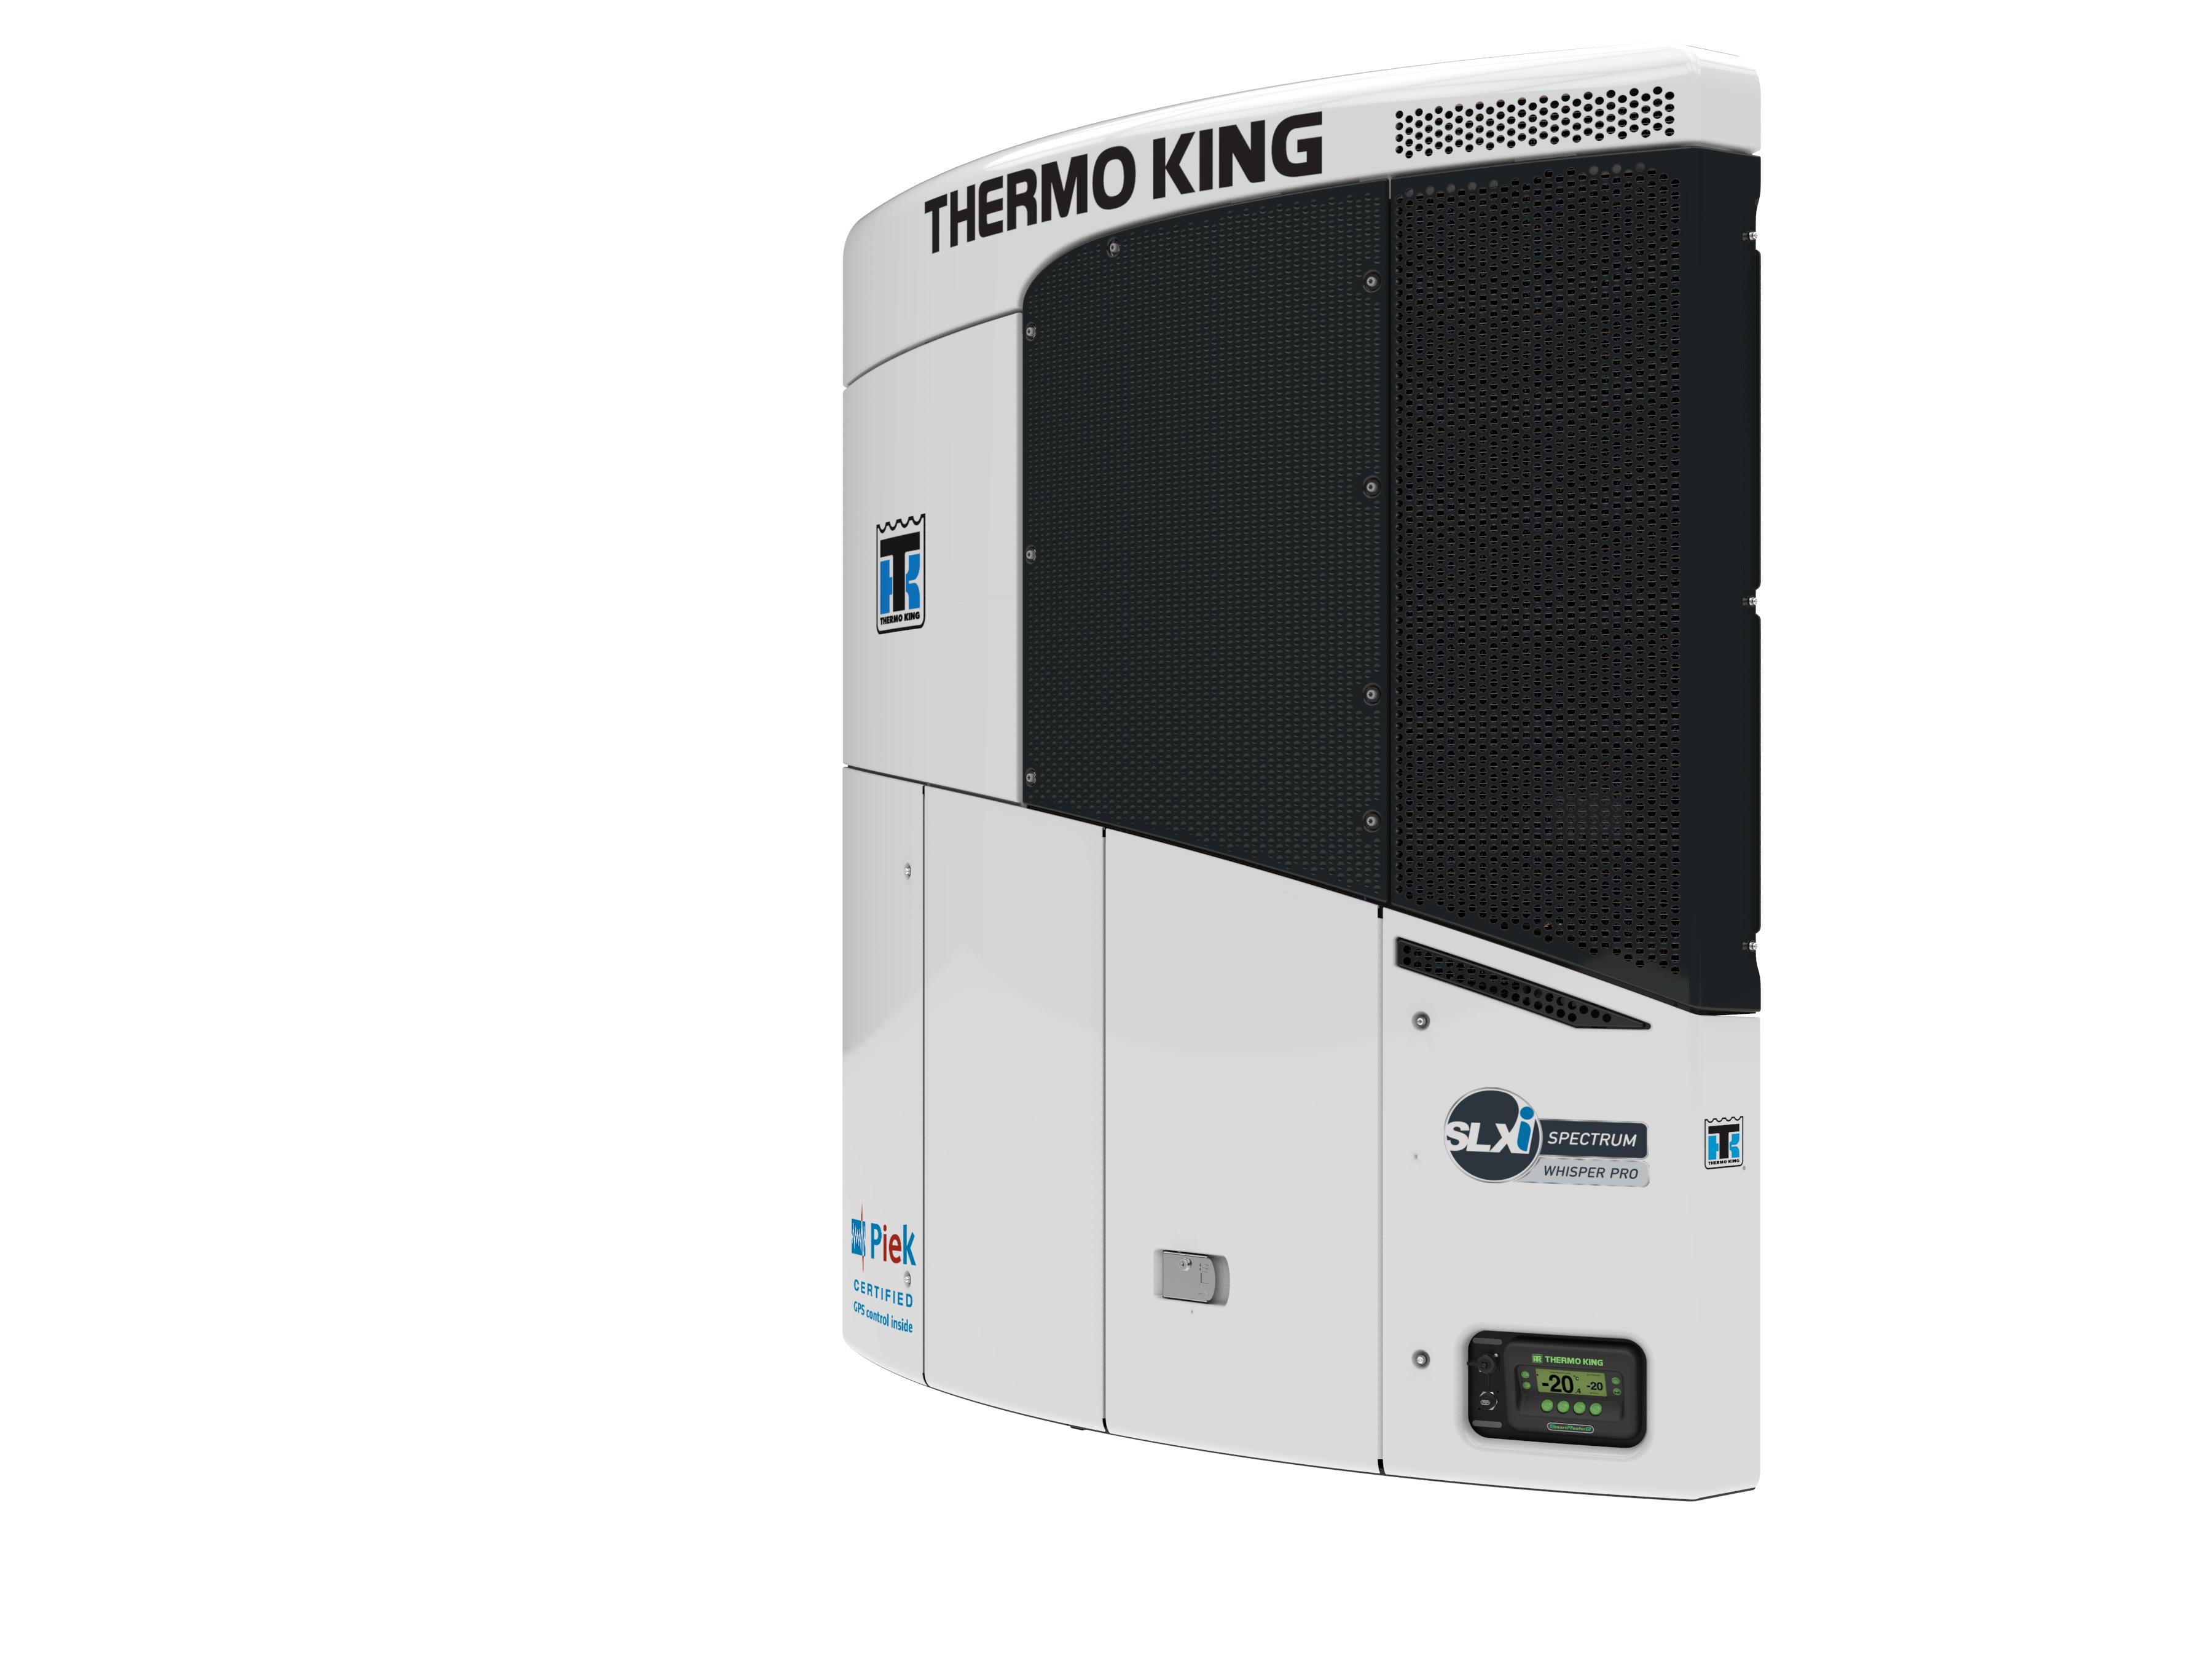 Thermo King Global